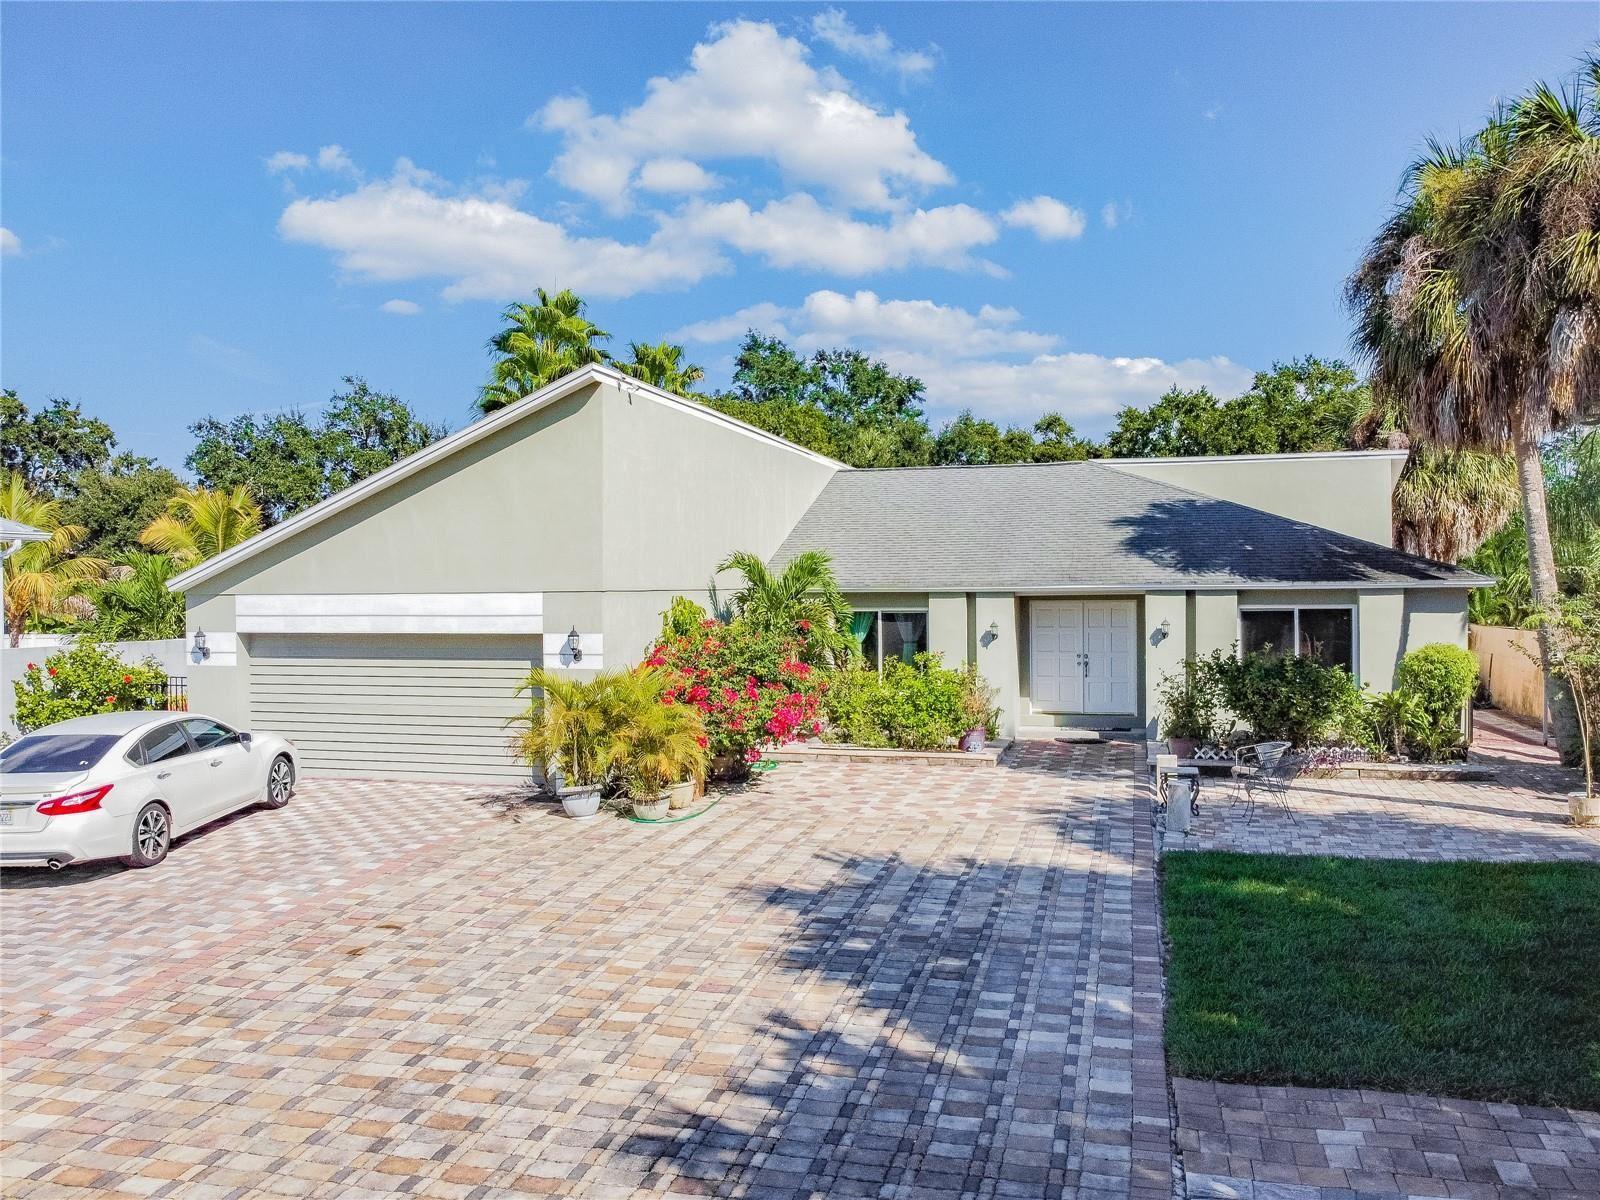 5005 TROYDALE ROAD, Tampa, FL 33615 - #: T3329225